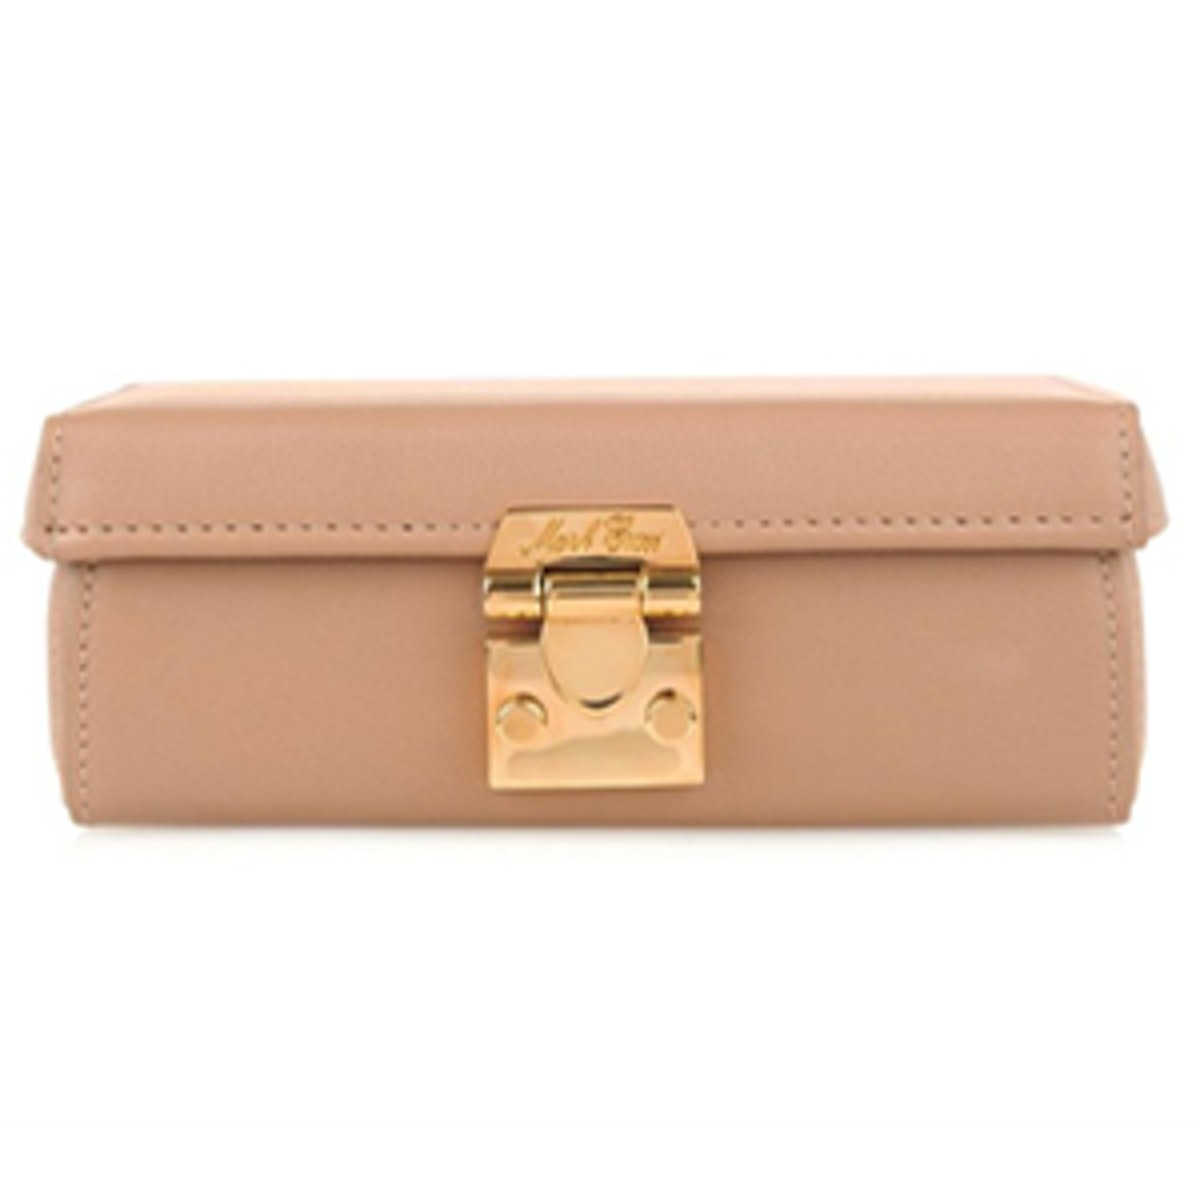 Grace Leather Clutch